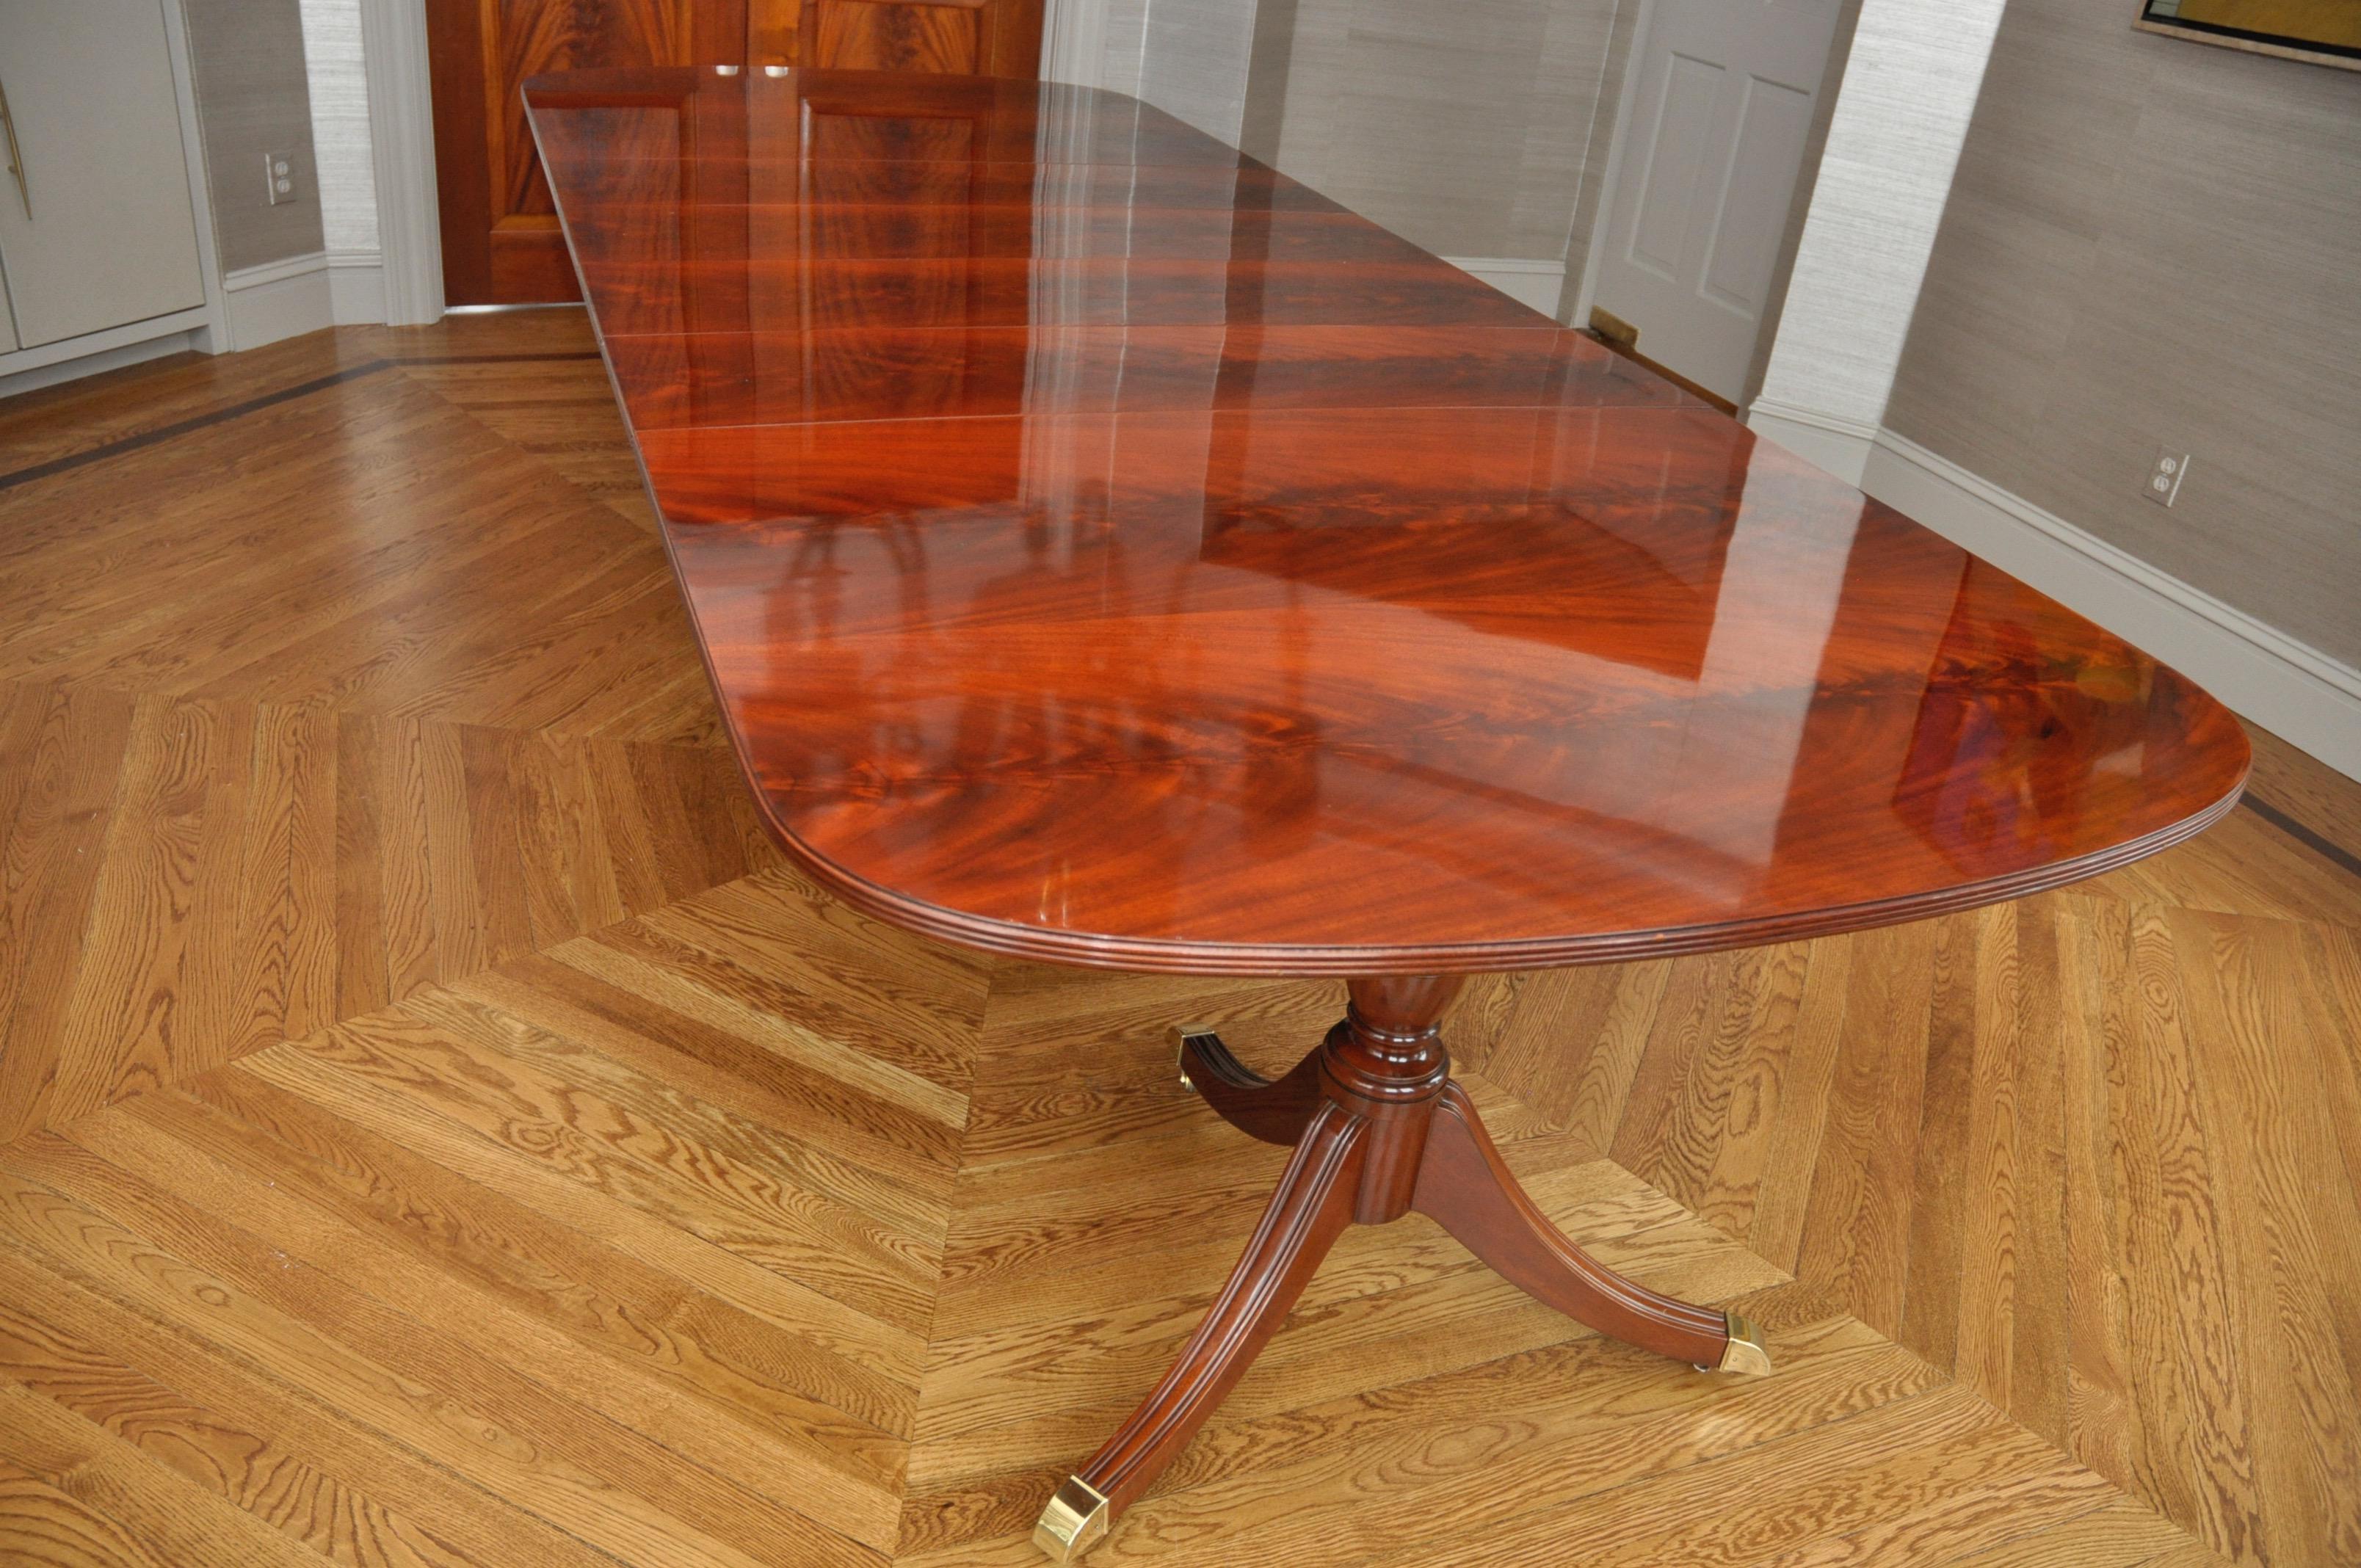 Kindel Crotch Mahogany Pedestal Dining Table Chairish : ed9f86c8 2888 4af3 b042 4cecbbb16378aspectfitampwidth640ampheight640 from www.chairish.com size 640 x 640 jpeg 47kB